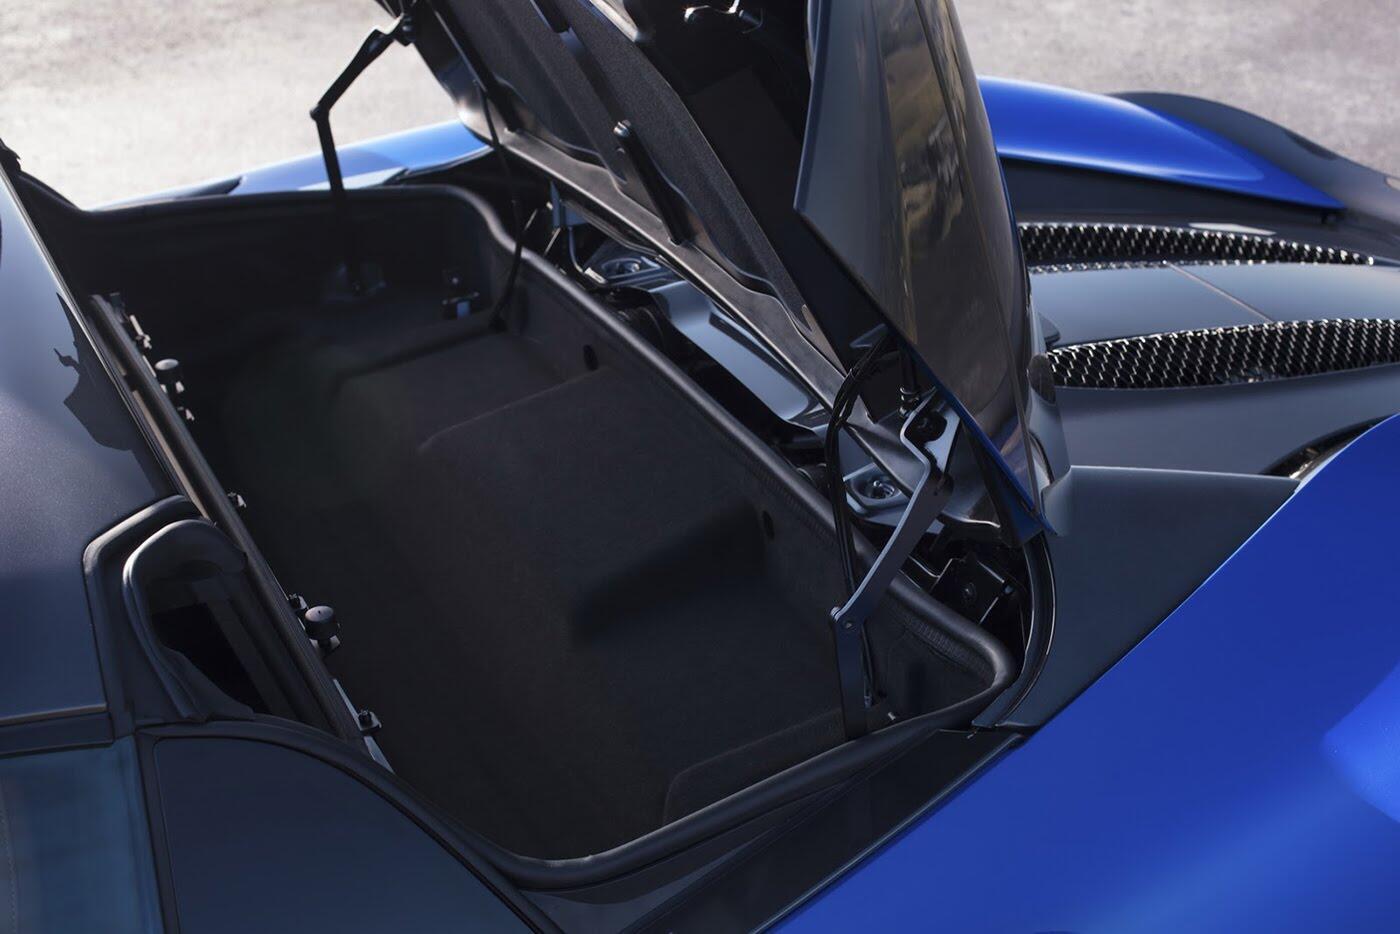 Siêu xe McLaren 570S Spider sắp ra mắt - Hình 7